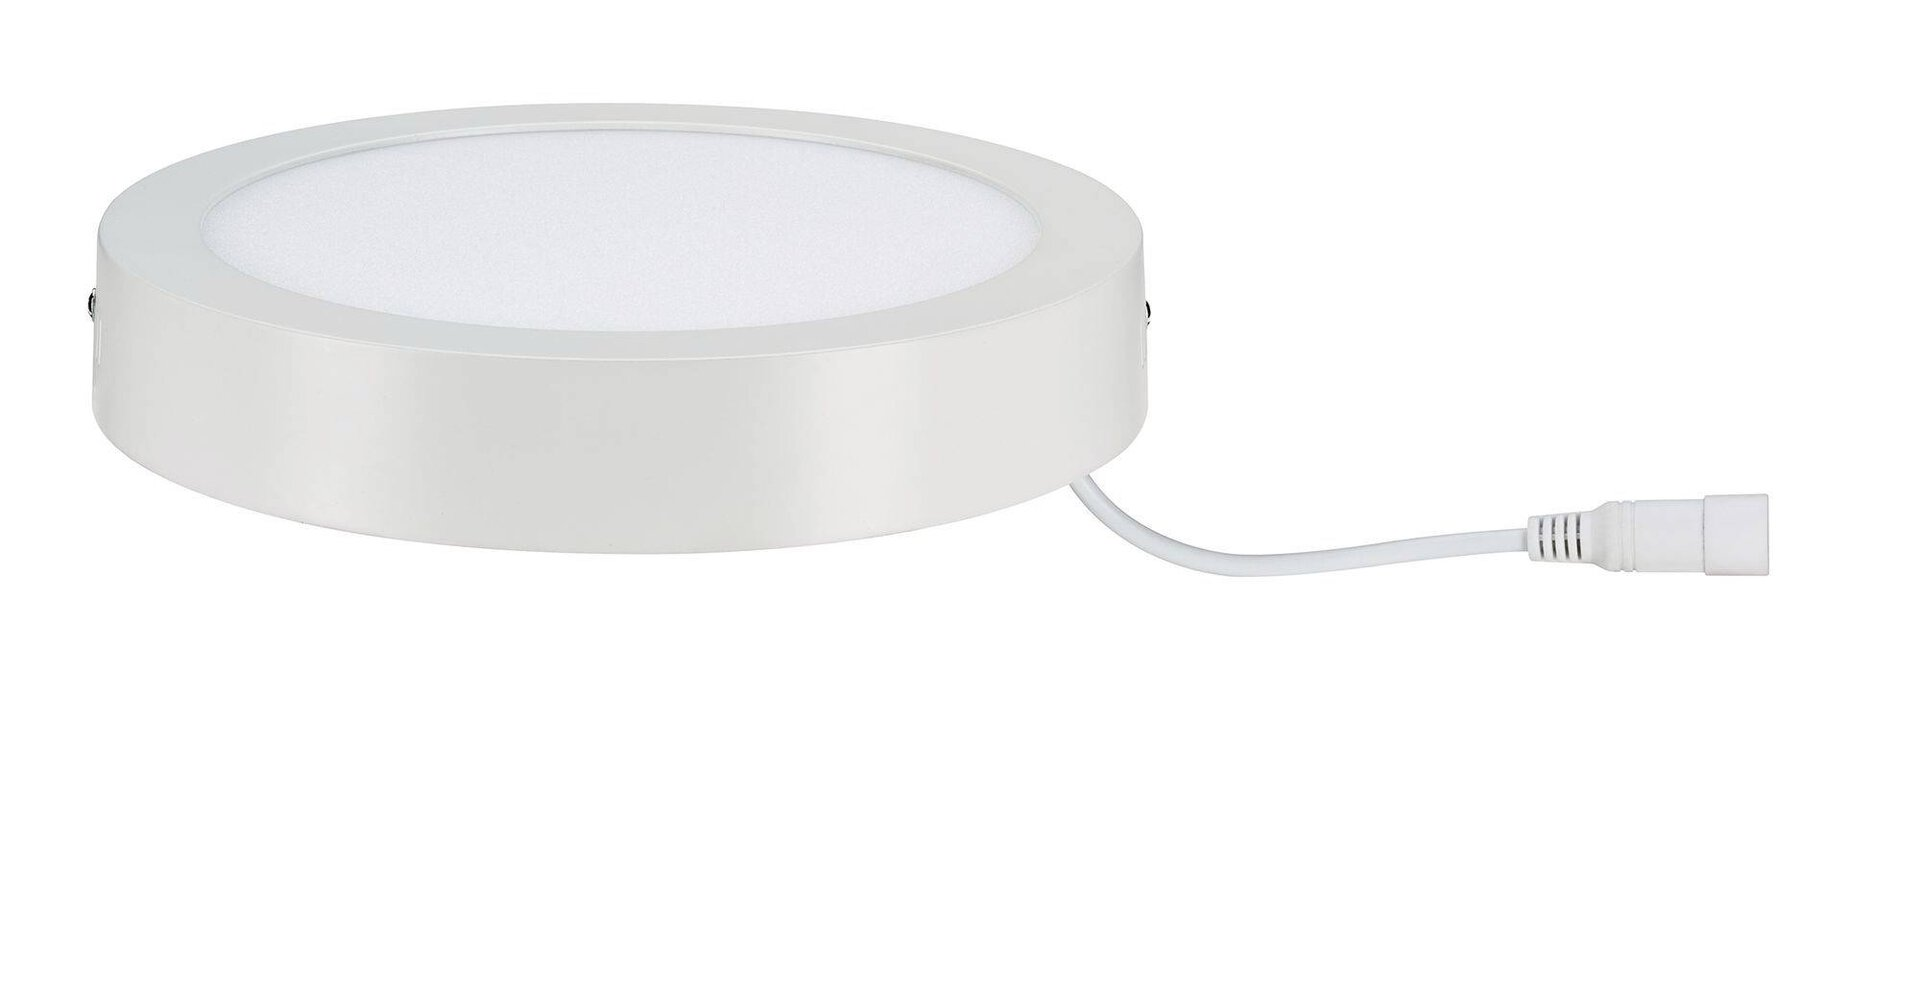 Deckenleuchte LUNAR Paulmann Metall weiß 23 x 4 x 23 cm